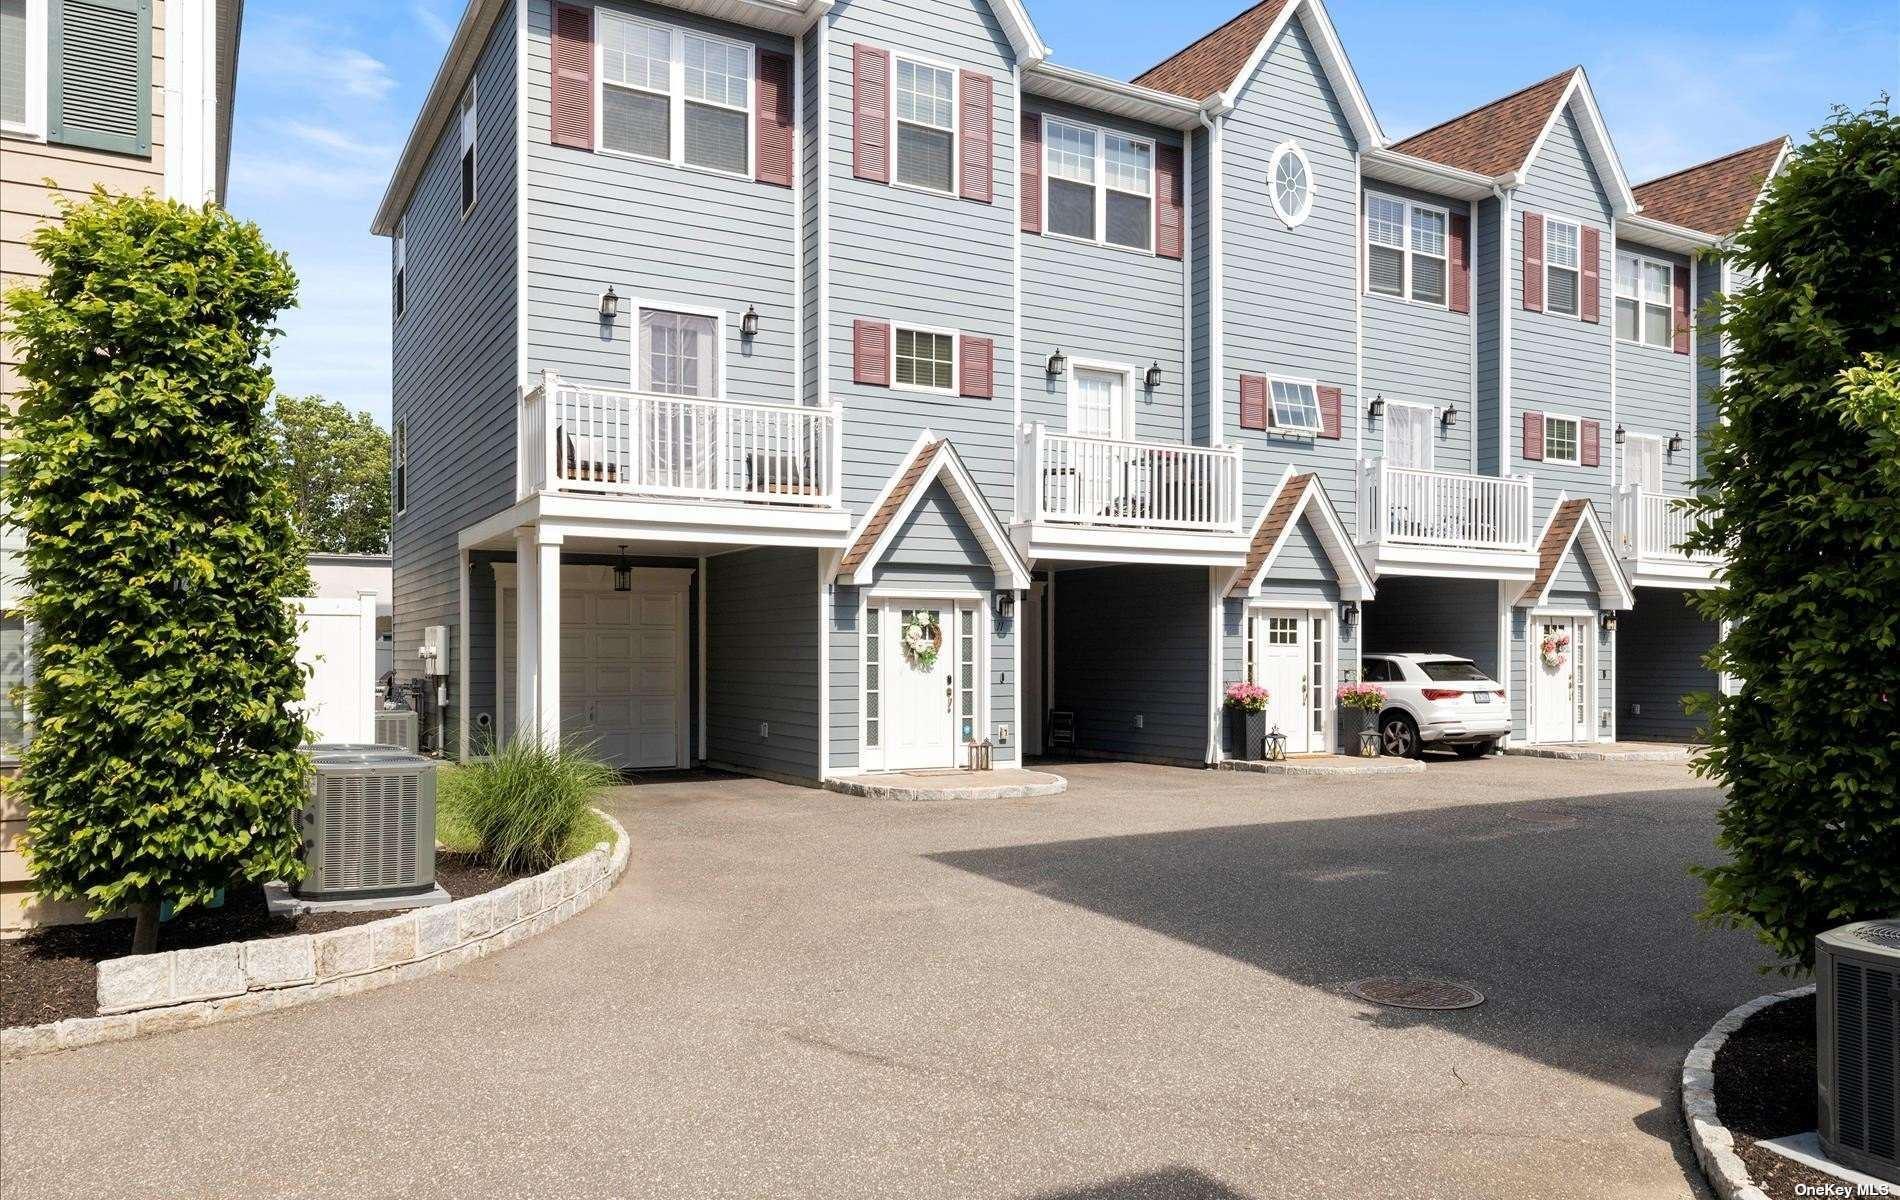 11 Hearthstone #11, Farmingdale, NY 11735 - MLS#: 3340474